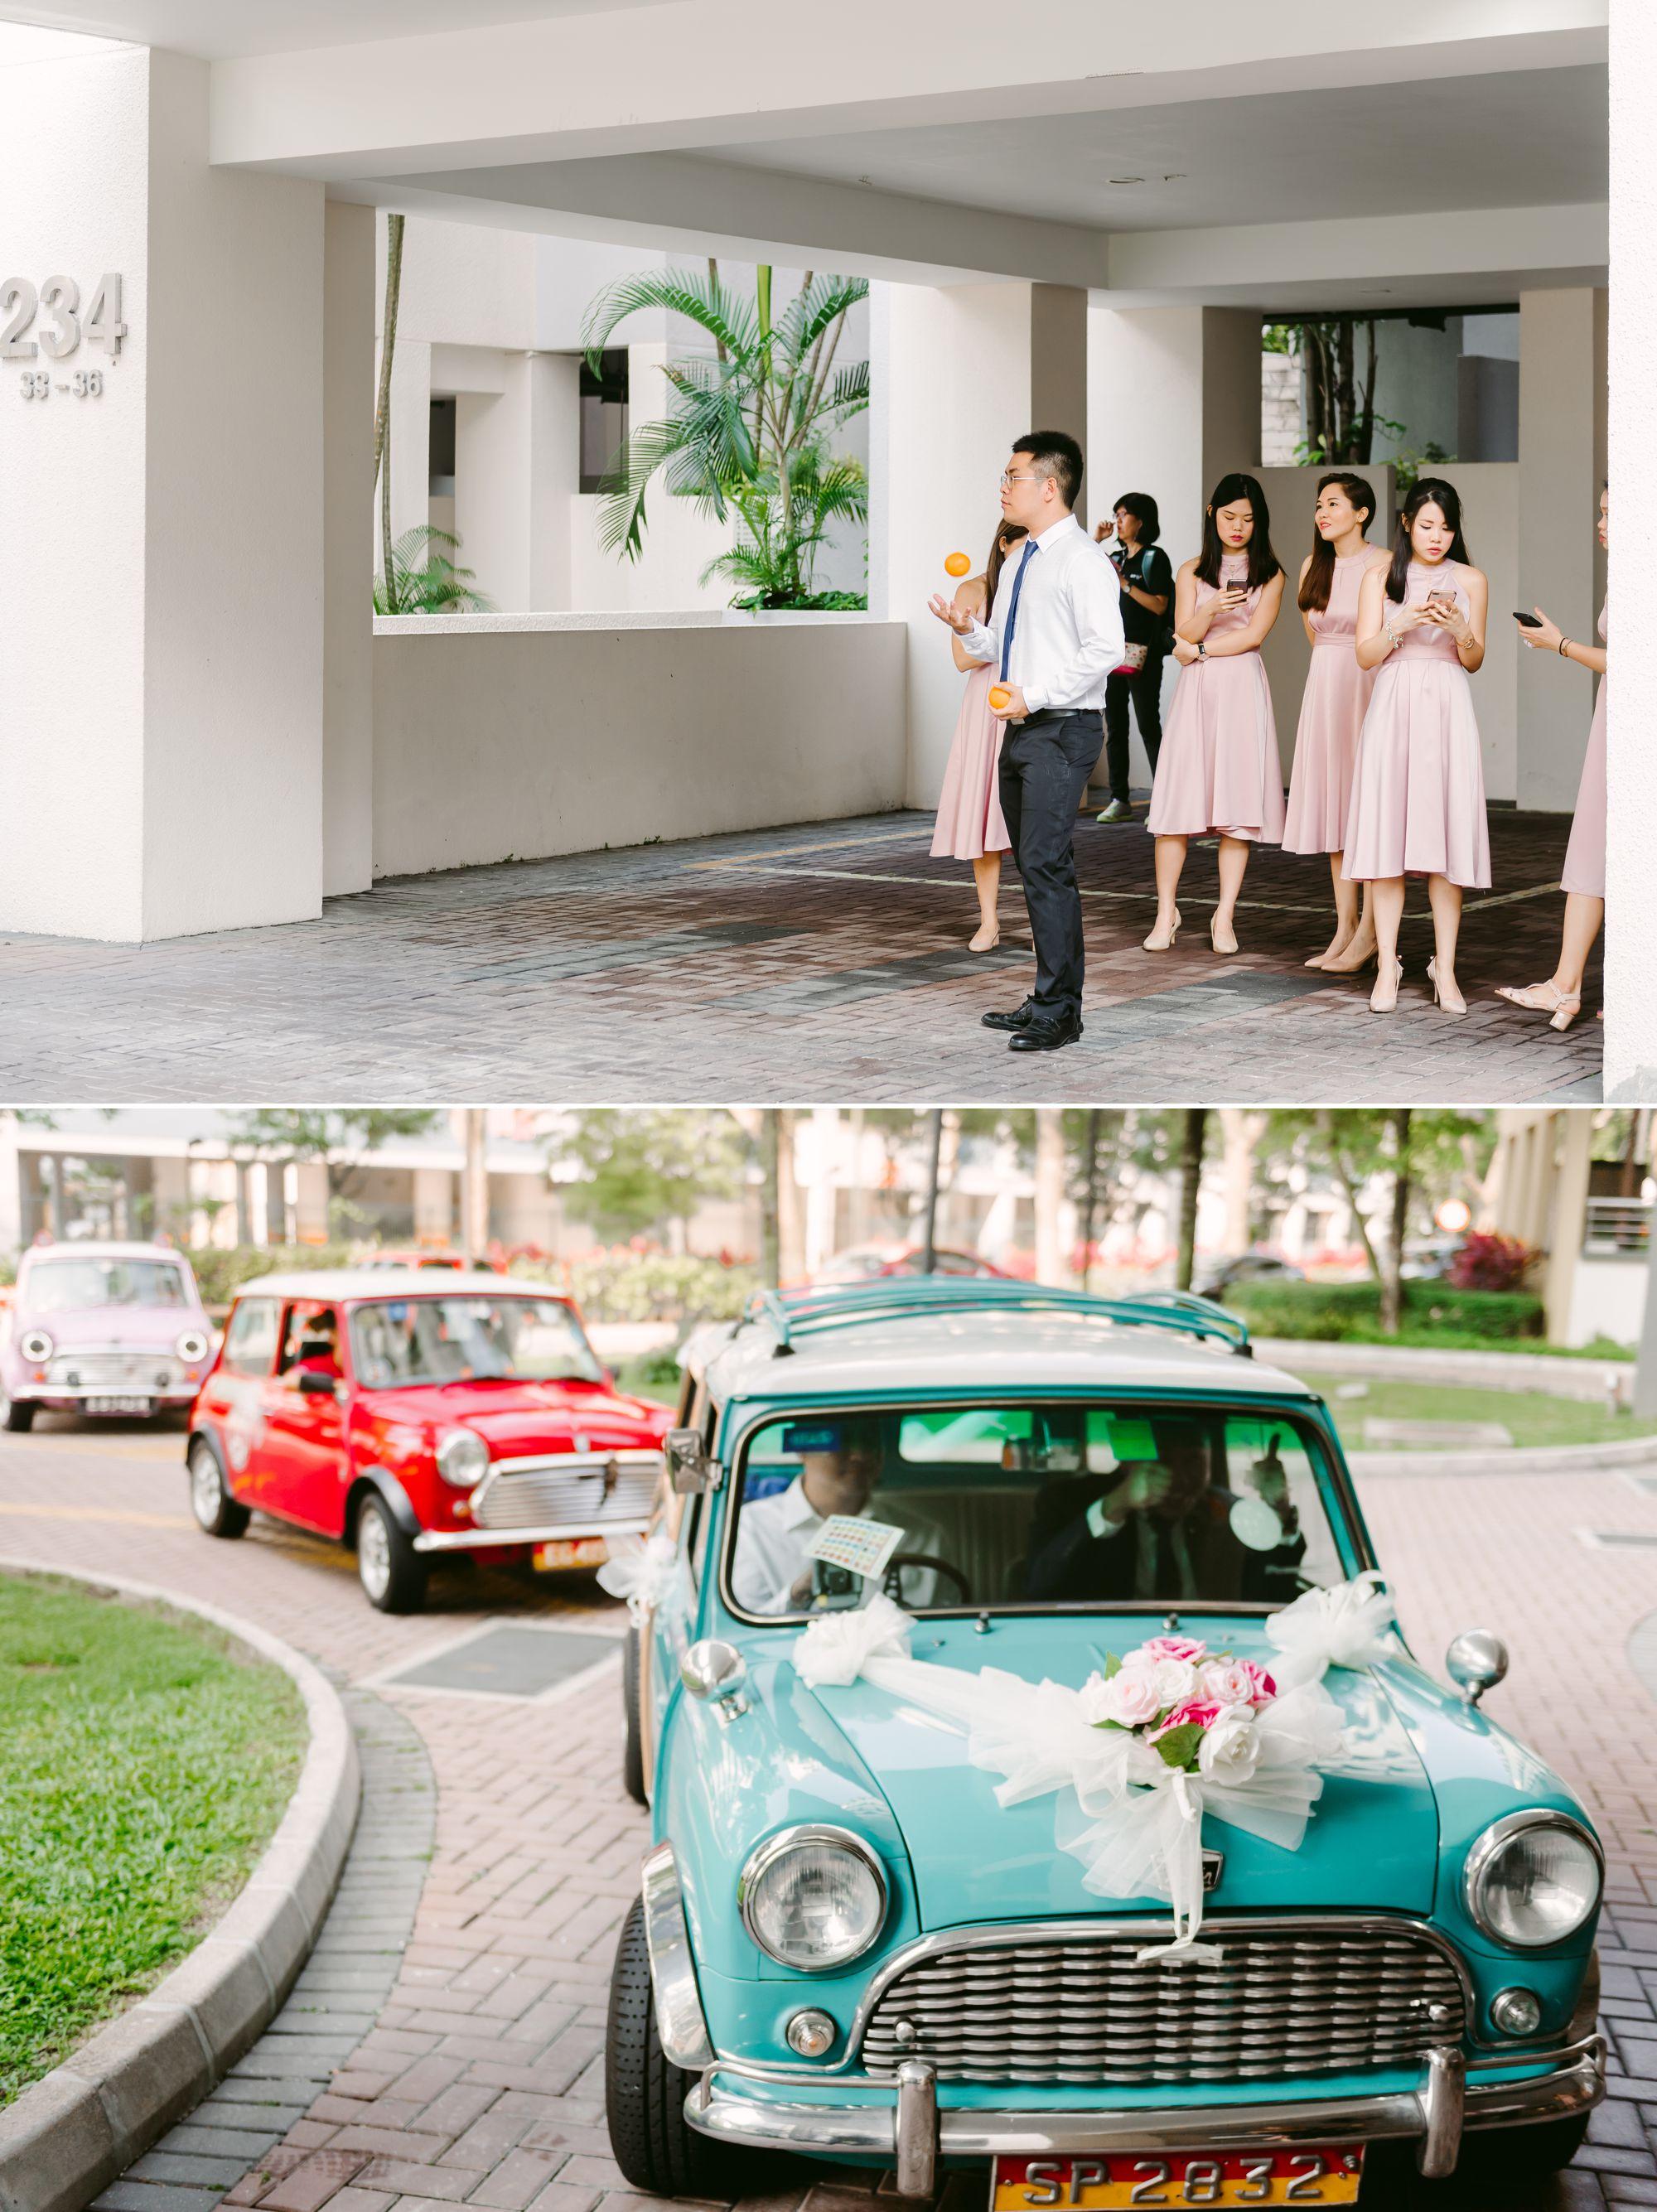 conrad_wedding_Singapore_ 8.jpg